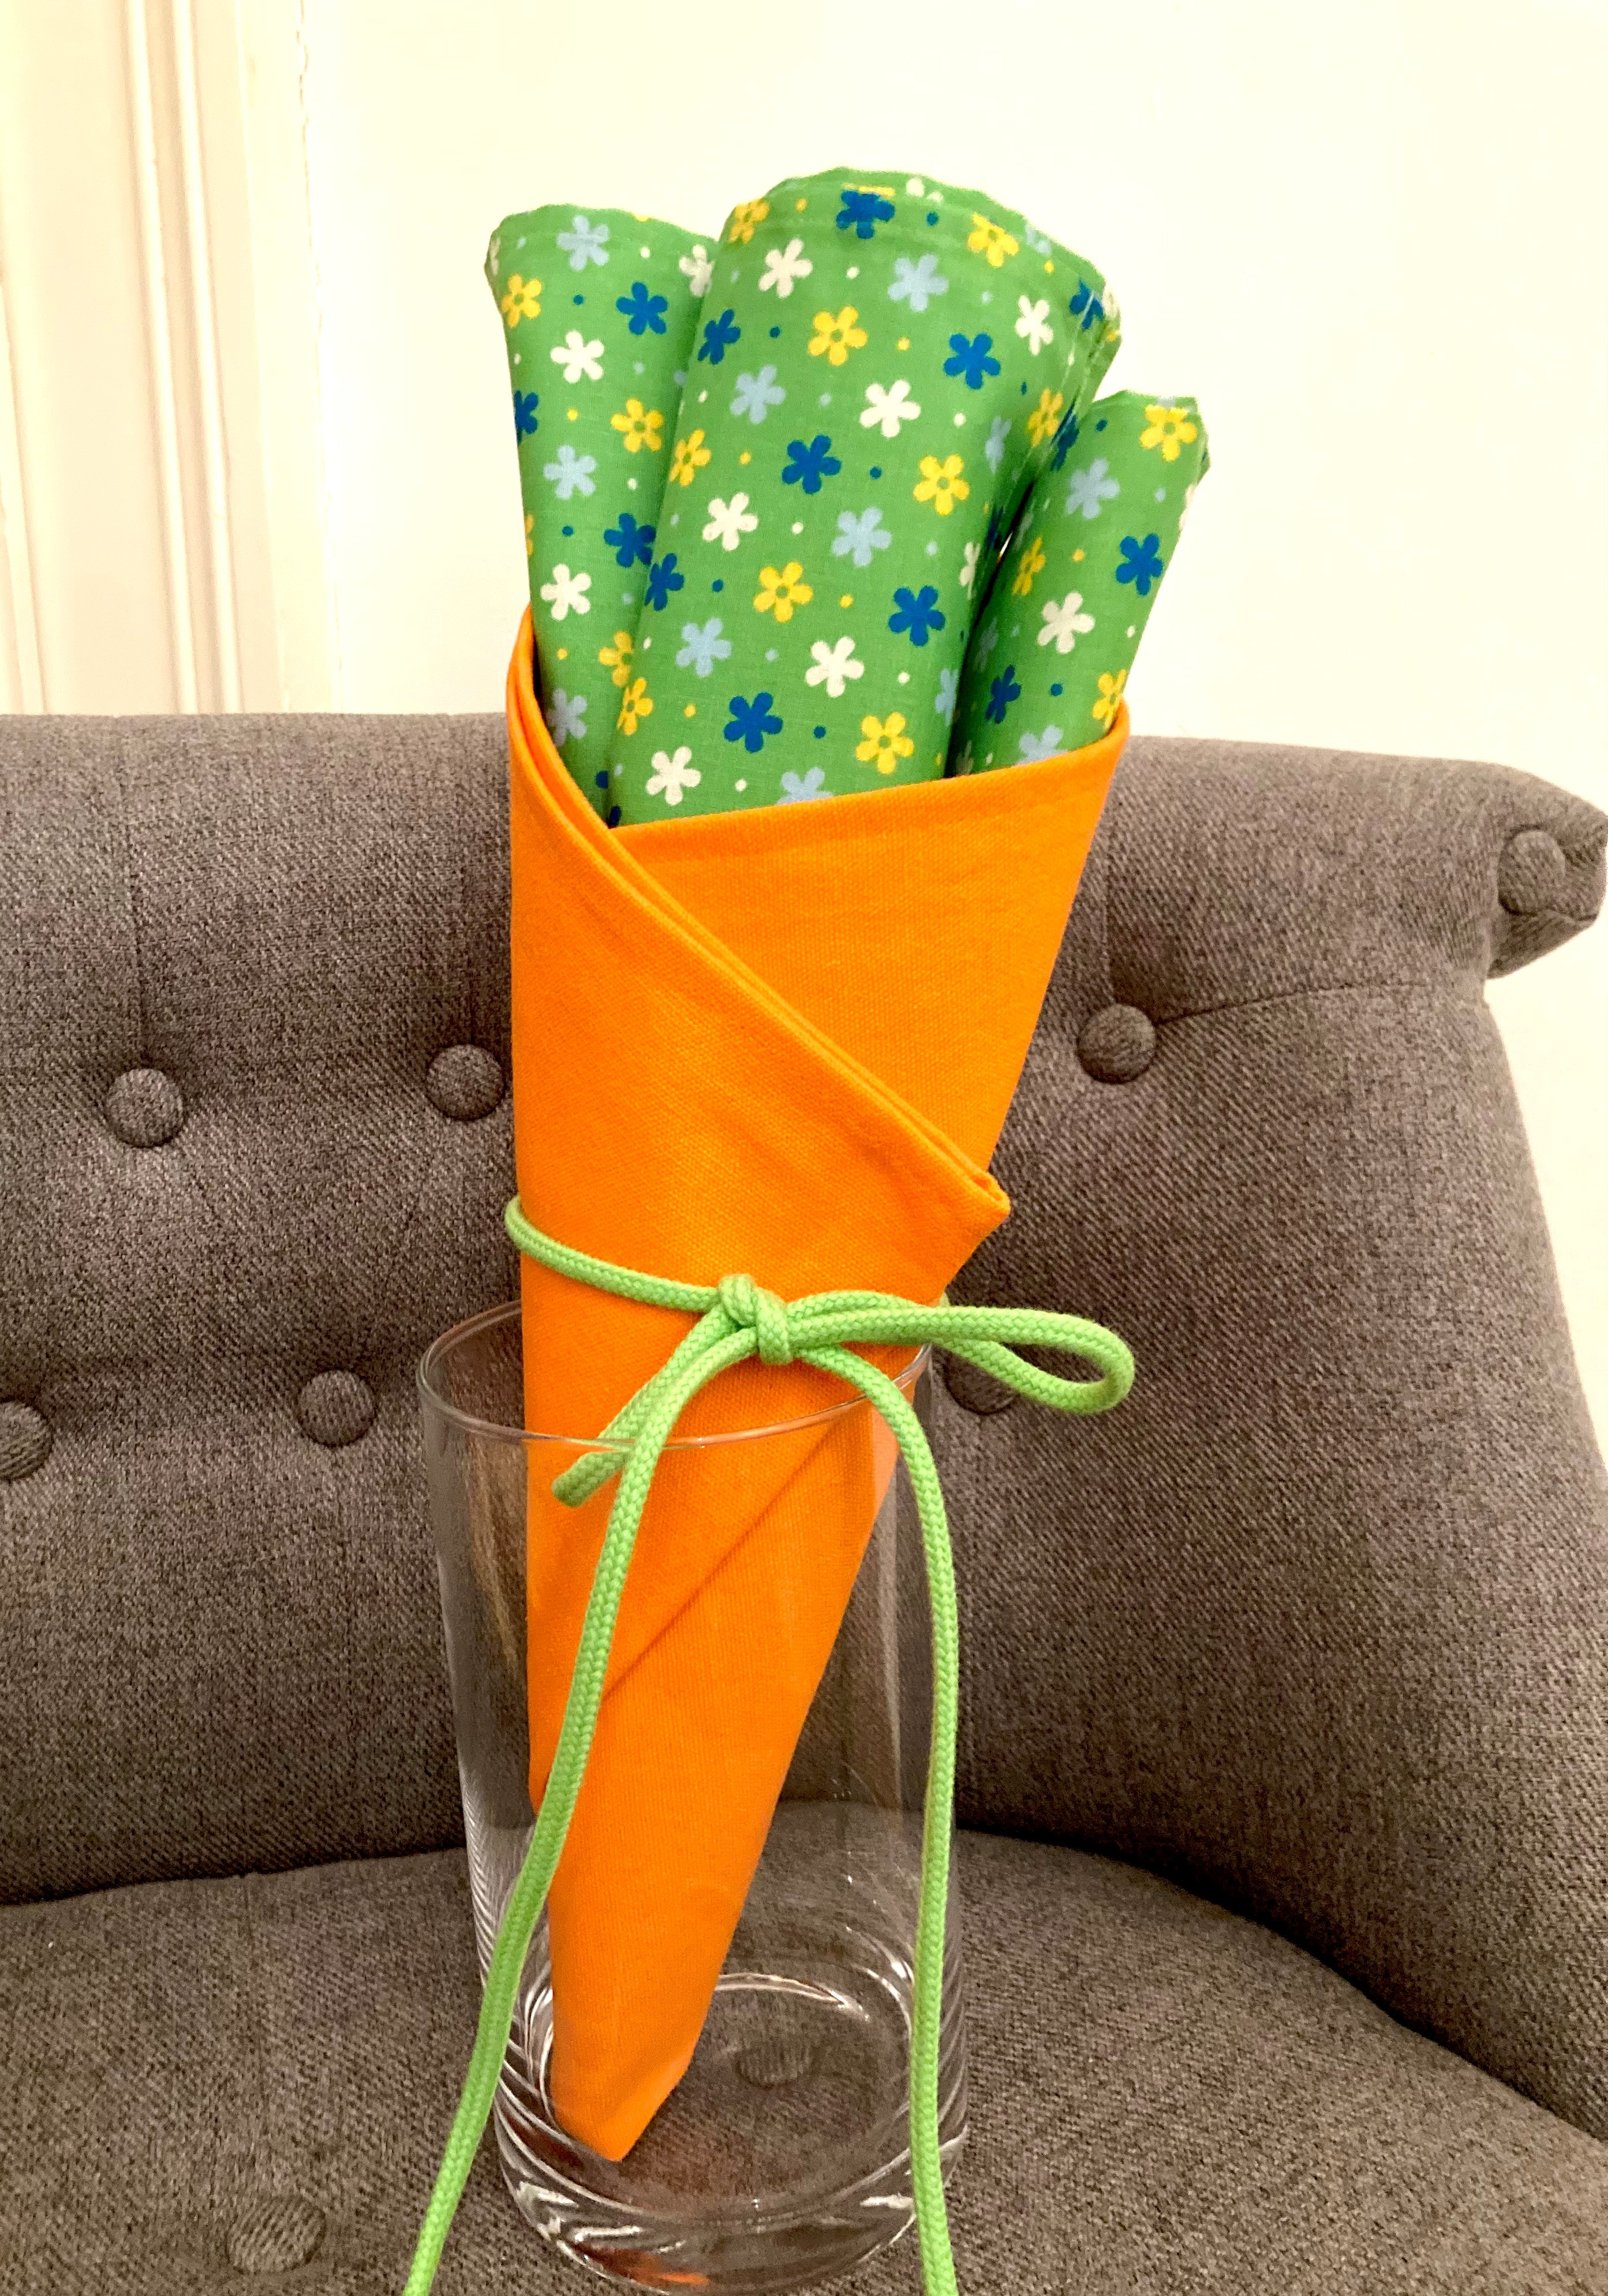 Einfach Frühlings-Karotte (60x45cm, 70x50cm)